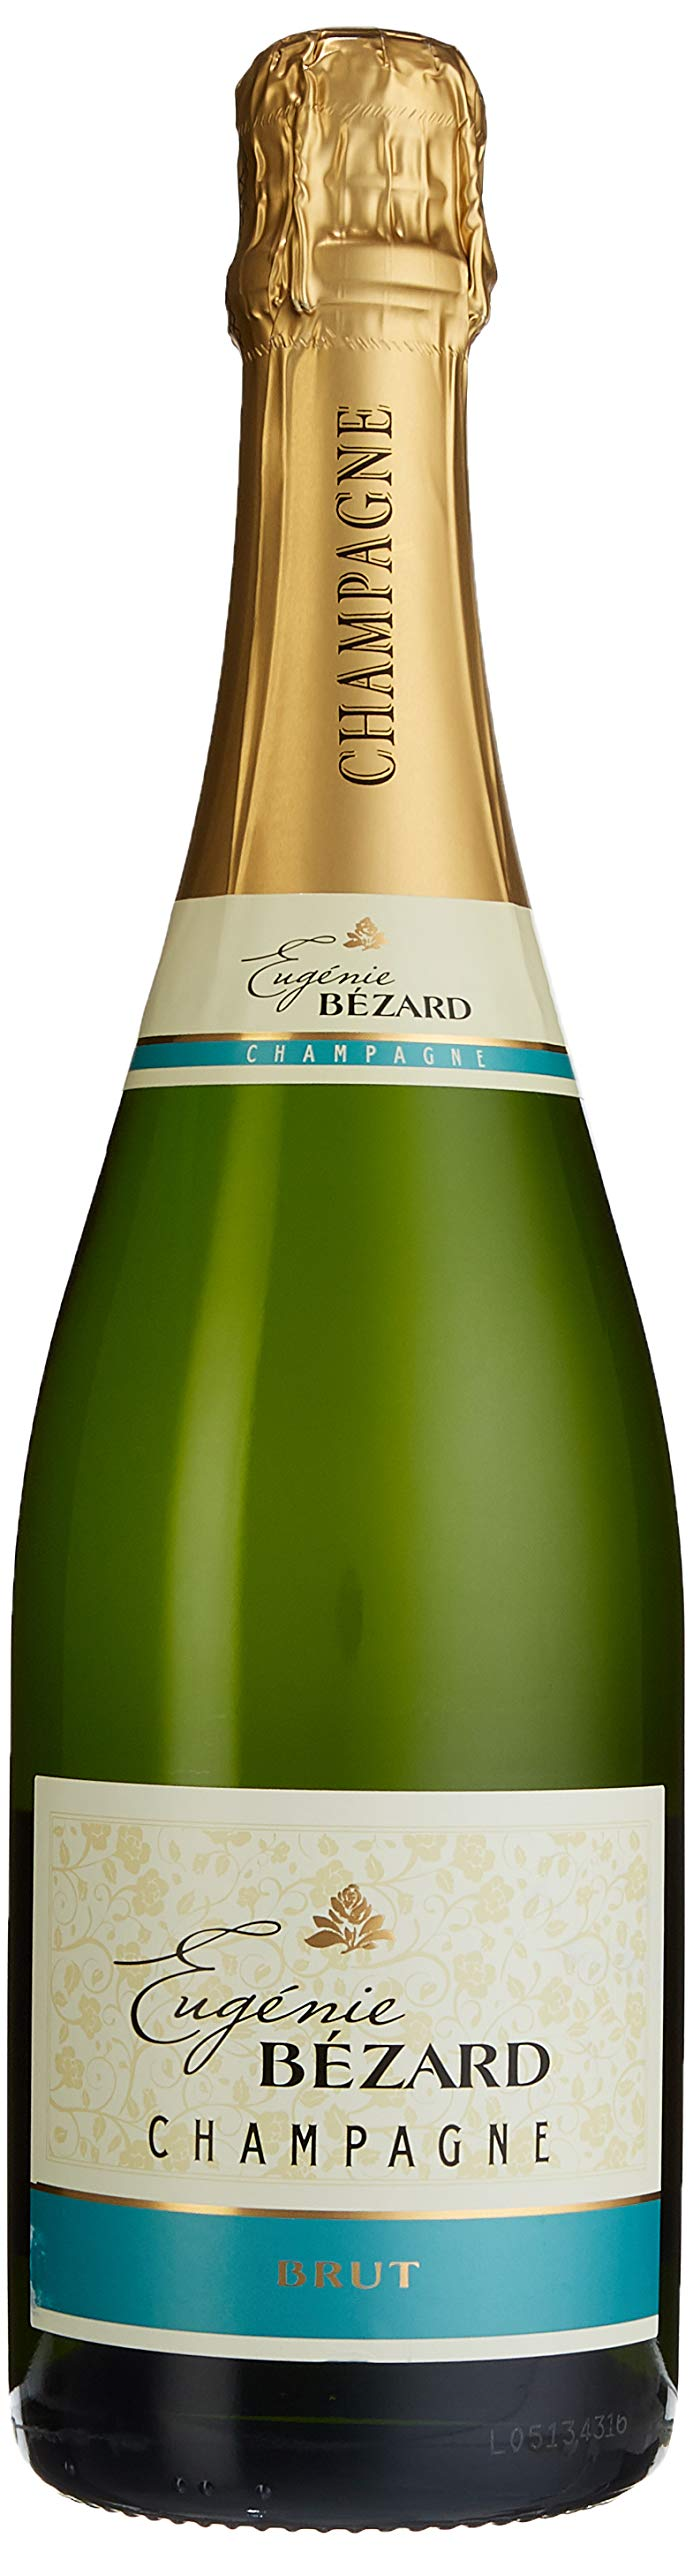 Meevio-Champagner-Veuve-Eugenie-Bezard-1-x-075-l